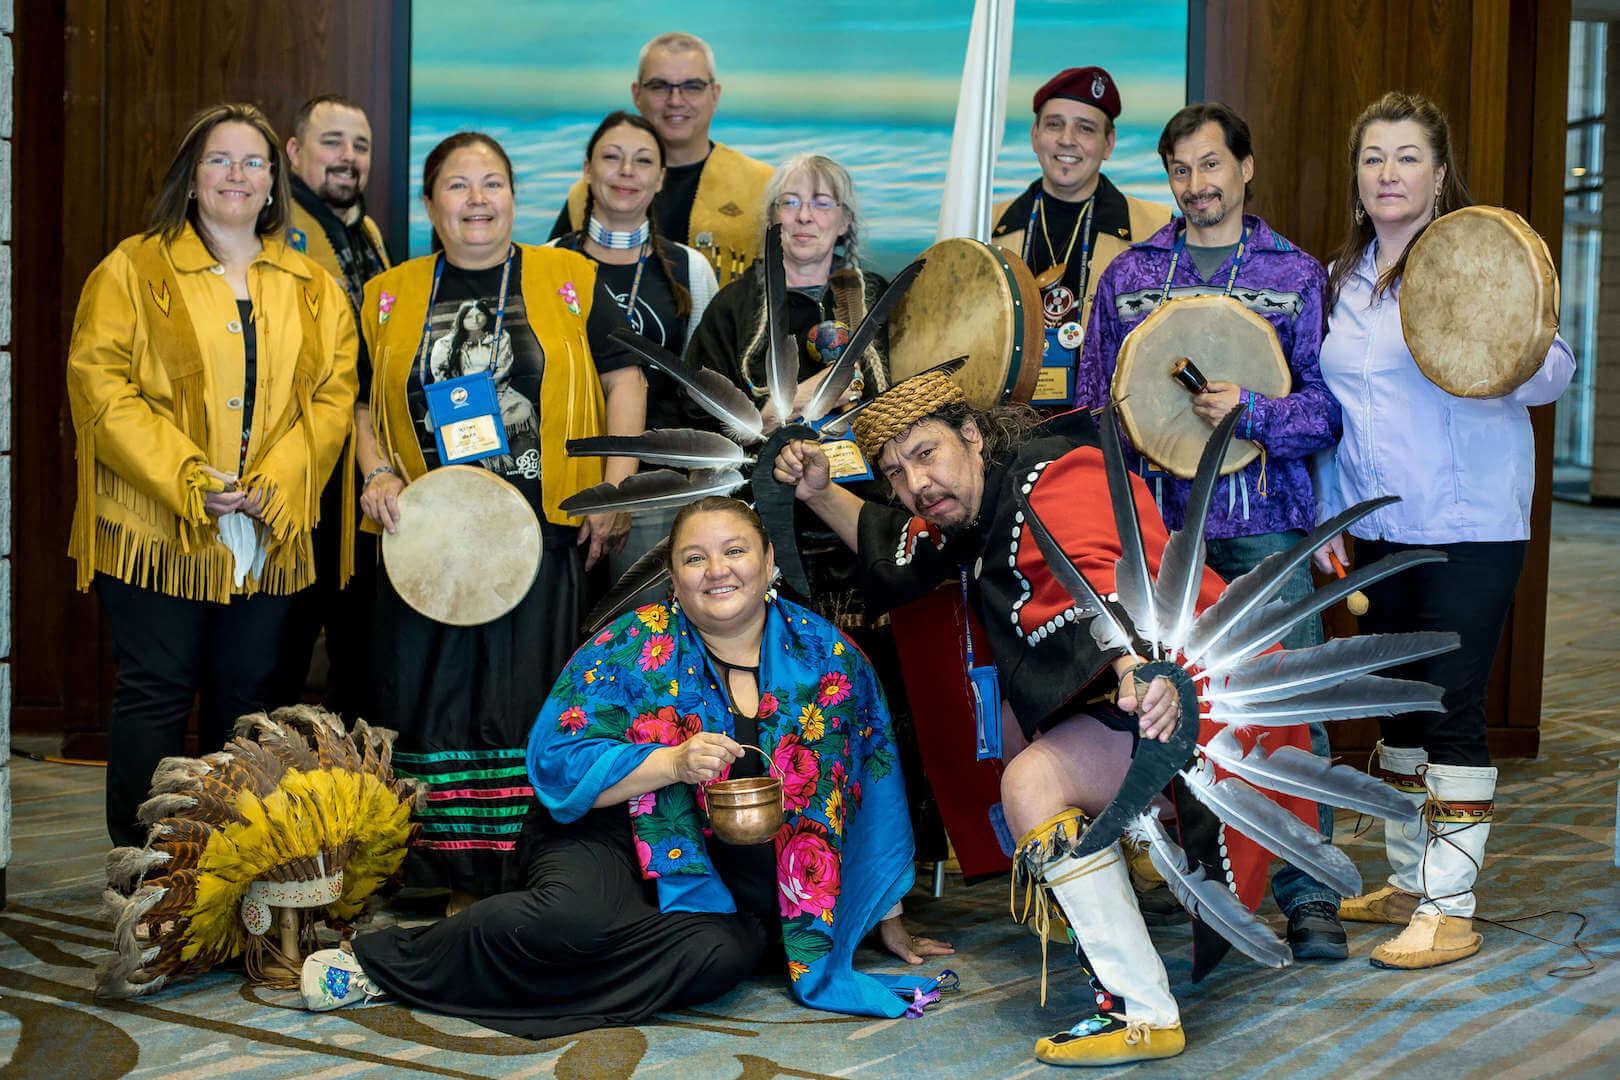 Photo 4 : National Convention 2019 / Congrès national de 2019